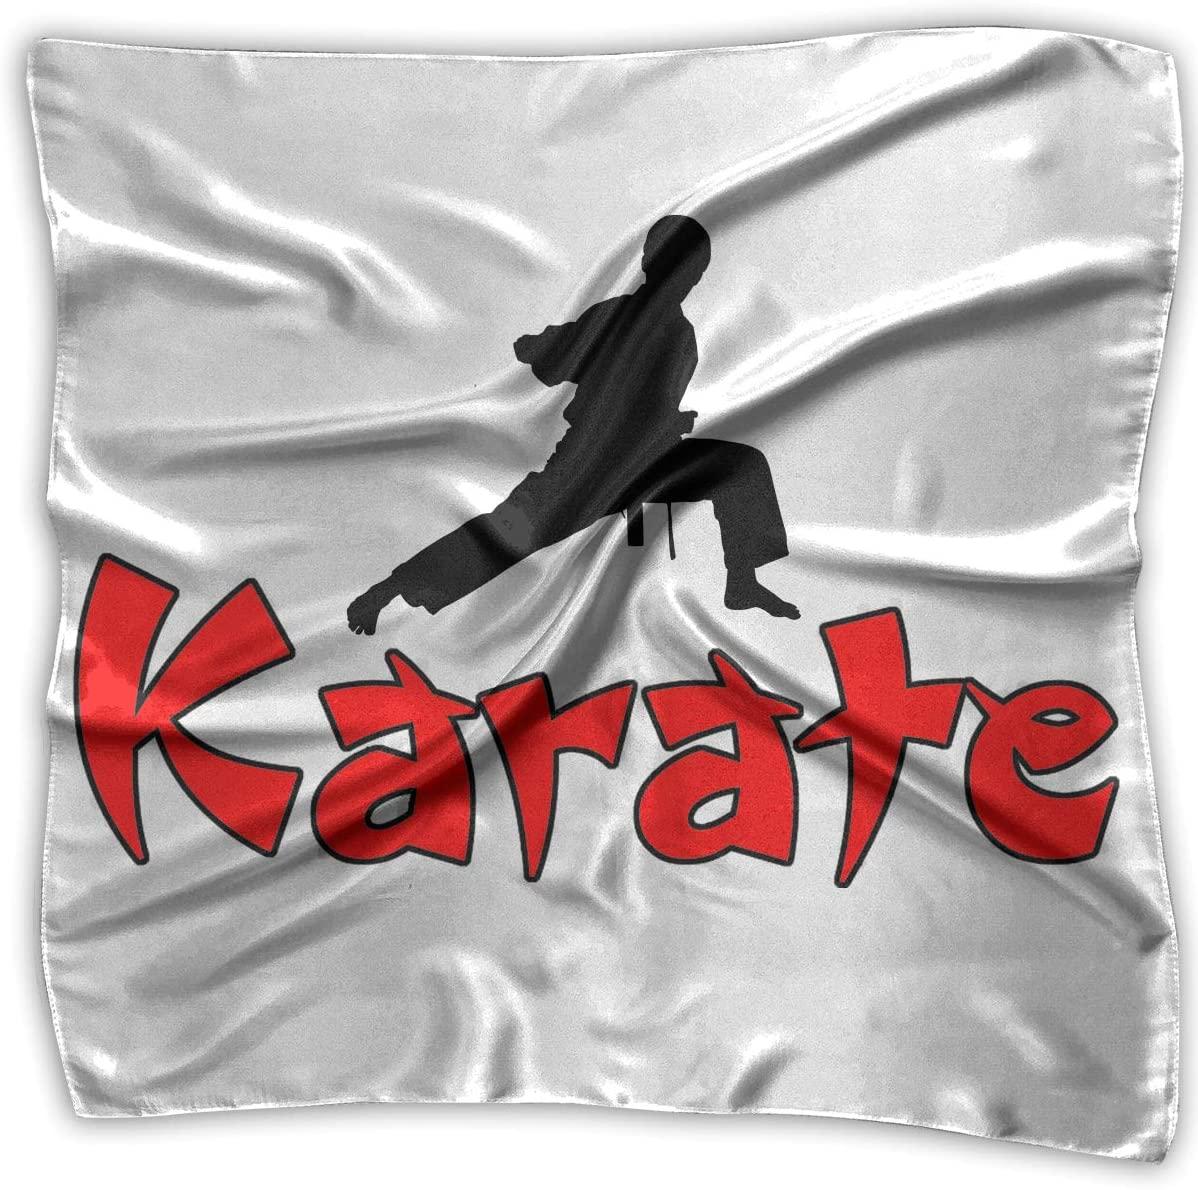 WFIRE Karate Square Handkerchiefs Scarf Shawl Bandanas Headscarf Neckerchief Tie Hair Scarf